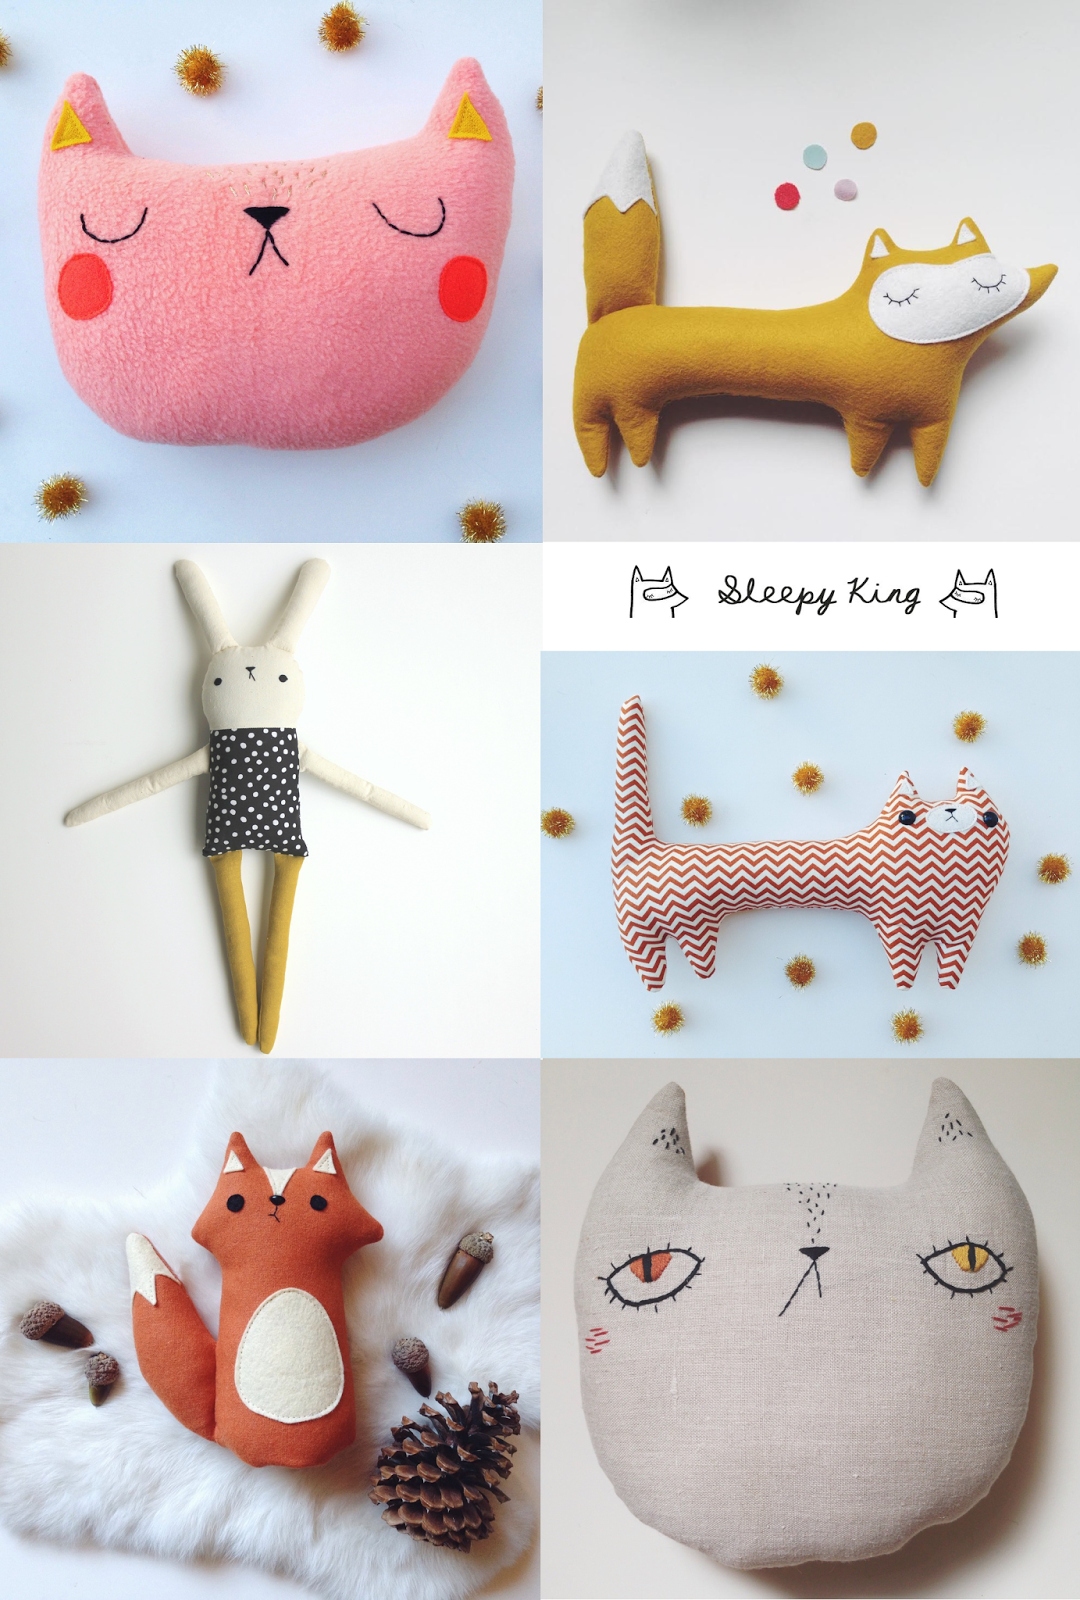 Ideen für süße Tiere zum Nähen | Nähtutorials | Pinterest | süße ...